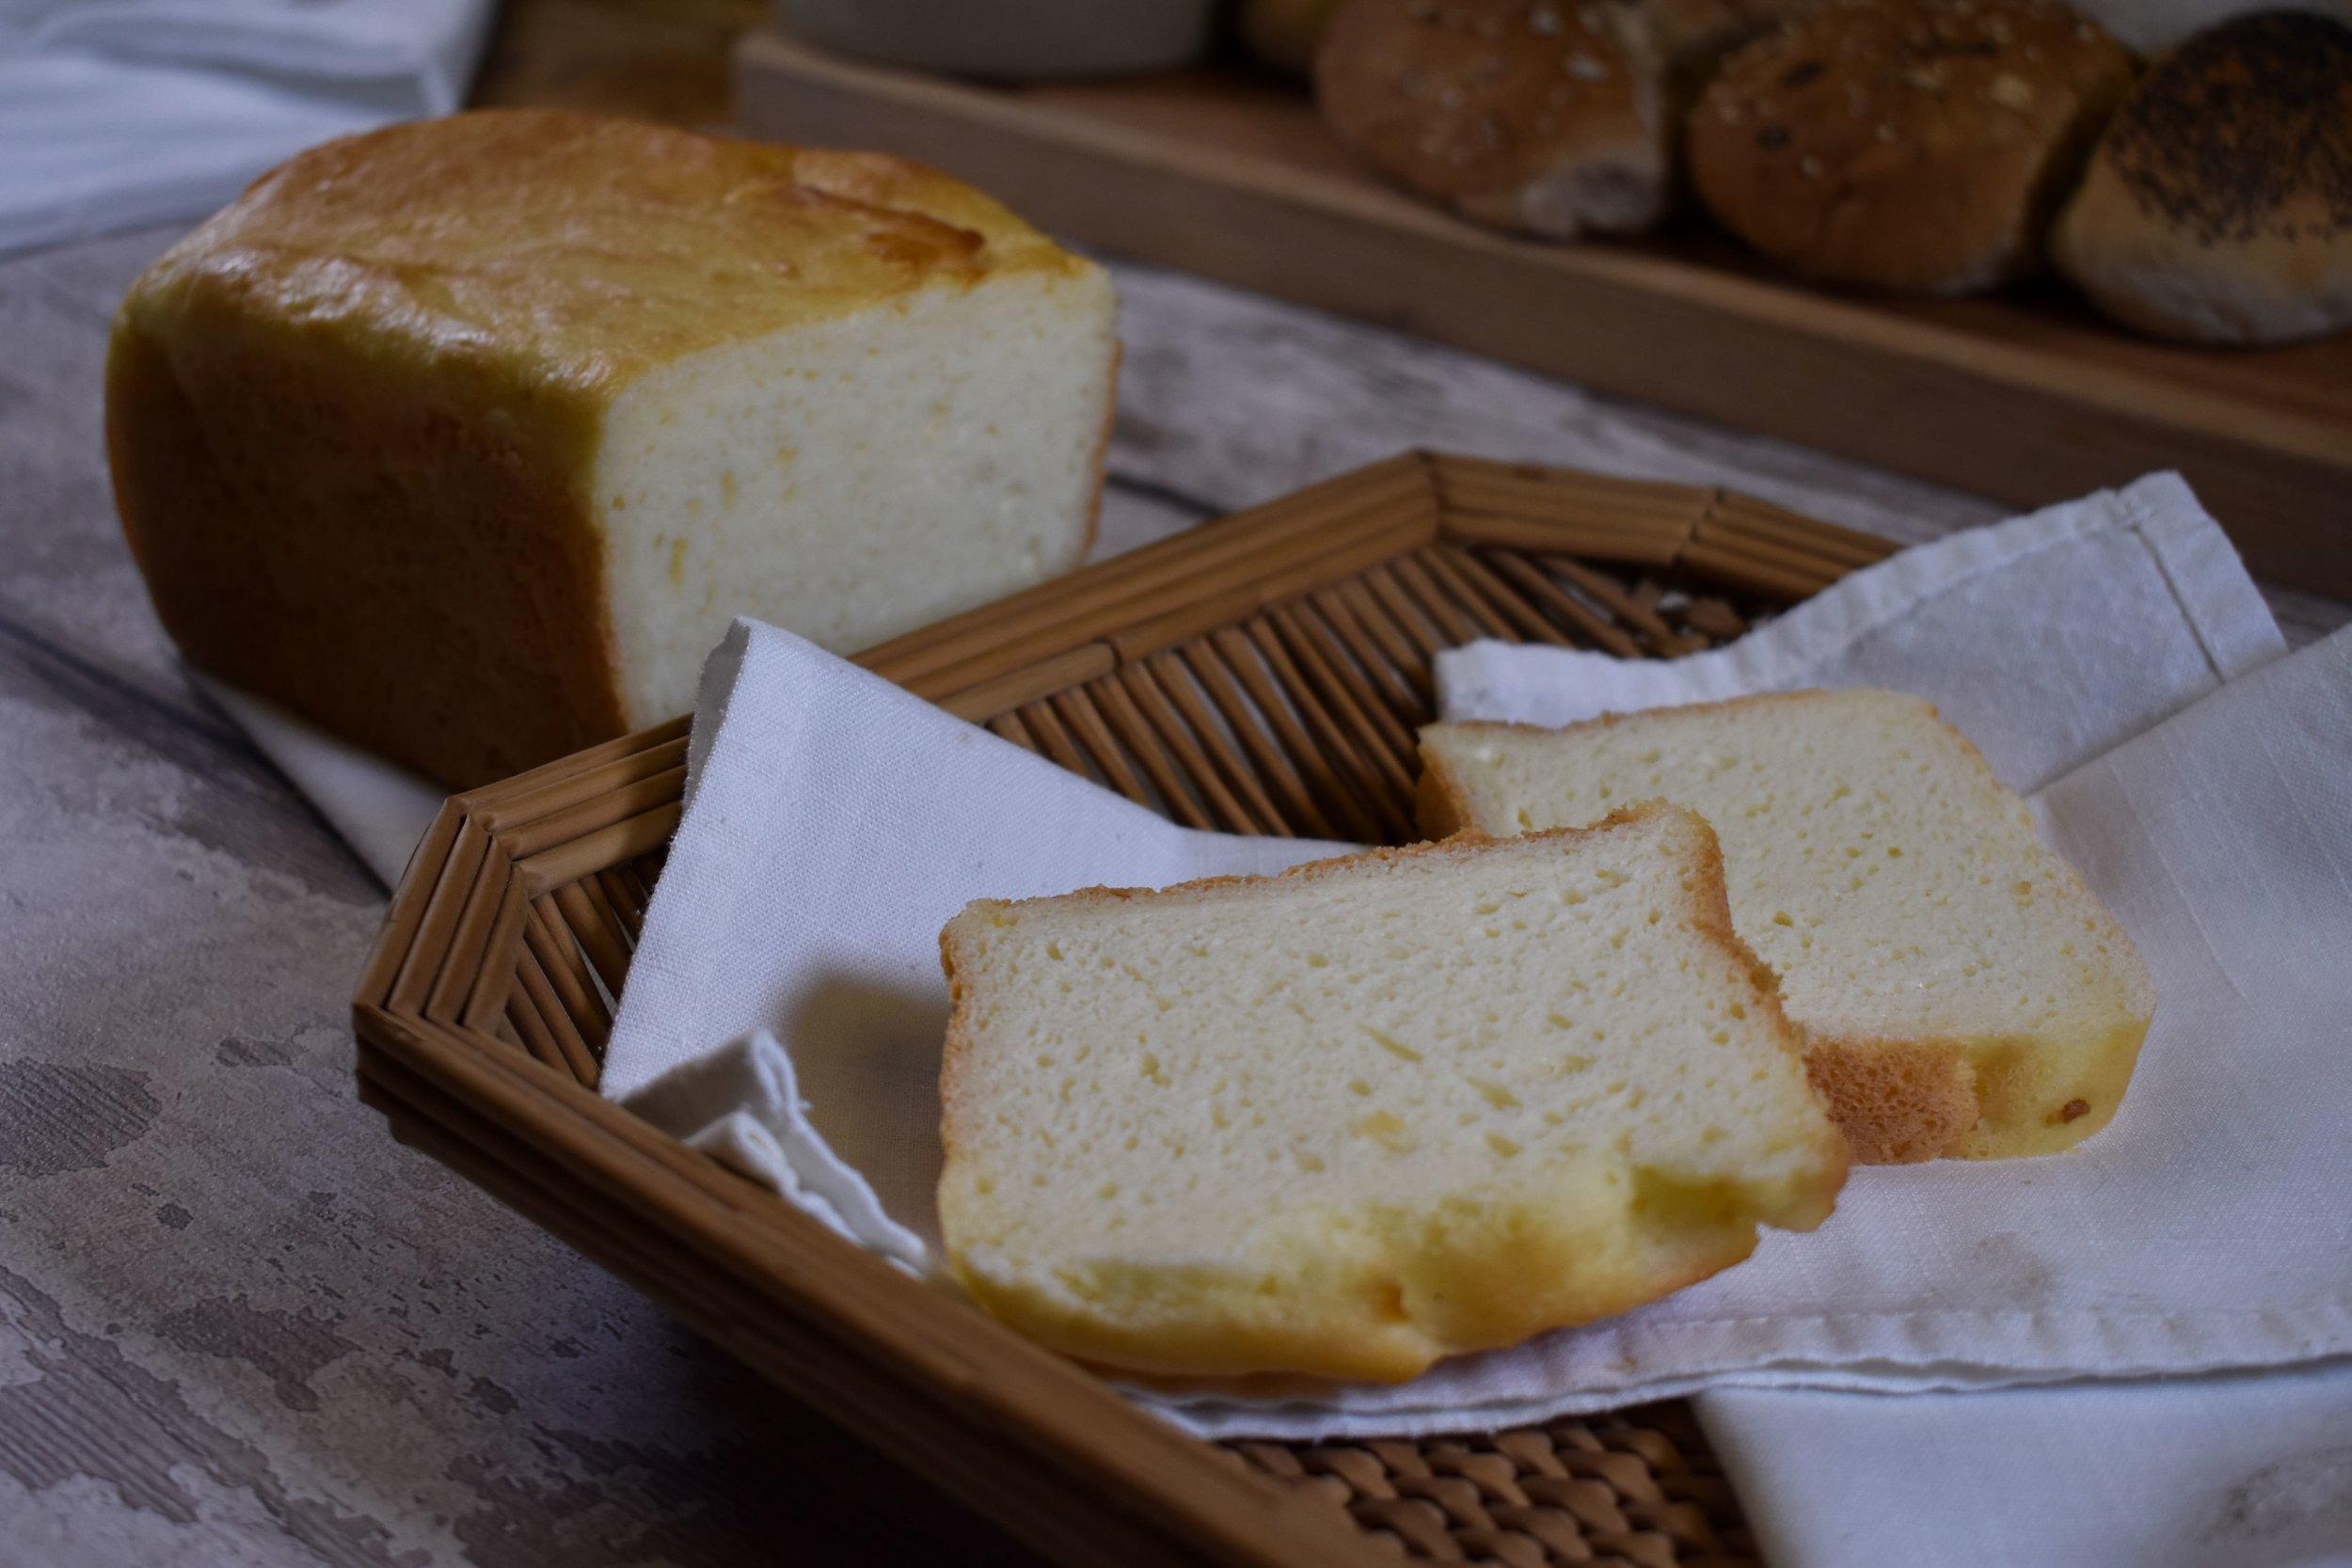 Gluten Free Loaf by Fosters Bakery